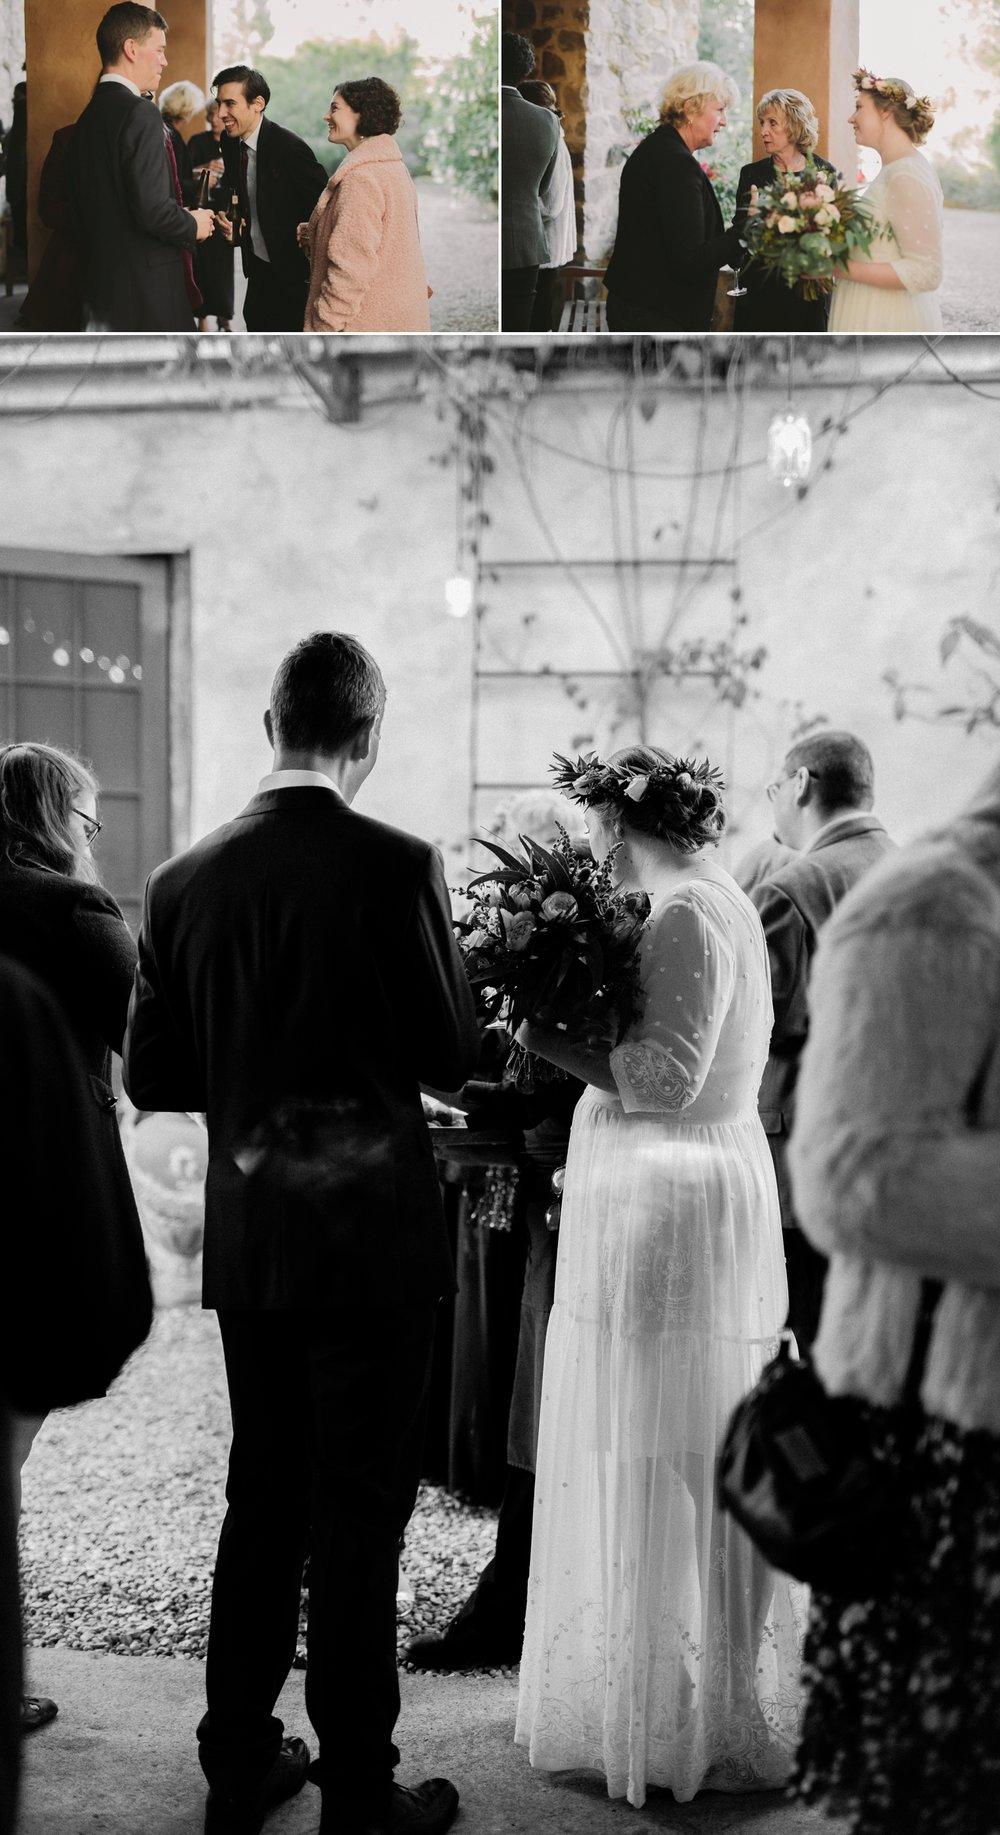 Jo & Aaron - Natural Wedding Photography in Adelaide - Beautiful, modern wedding photographer - Al Ru Farm Wedding Photography - Katherine Schultz_0021.jpg